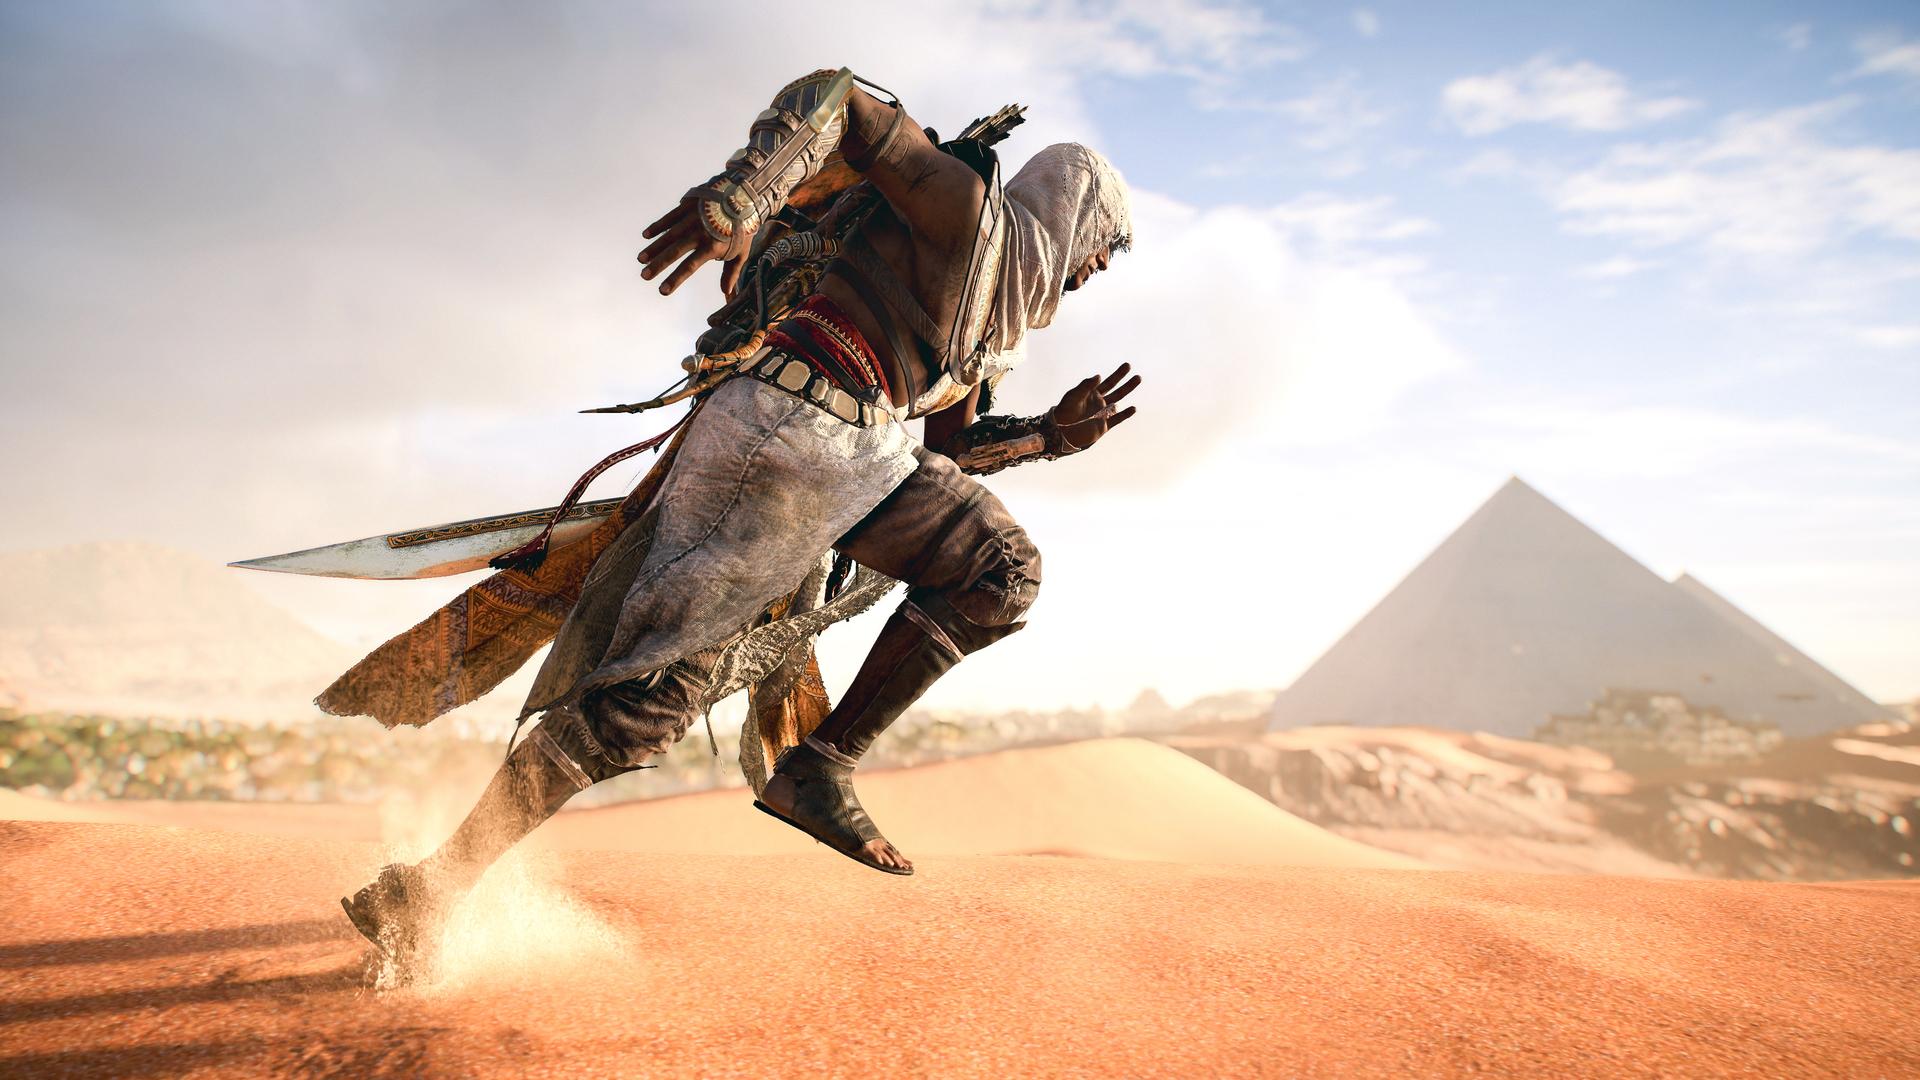 1920x1080 Assassins Creed Origins 4k 2018 Laptop Full Hd 1080p Hd